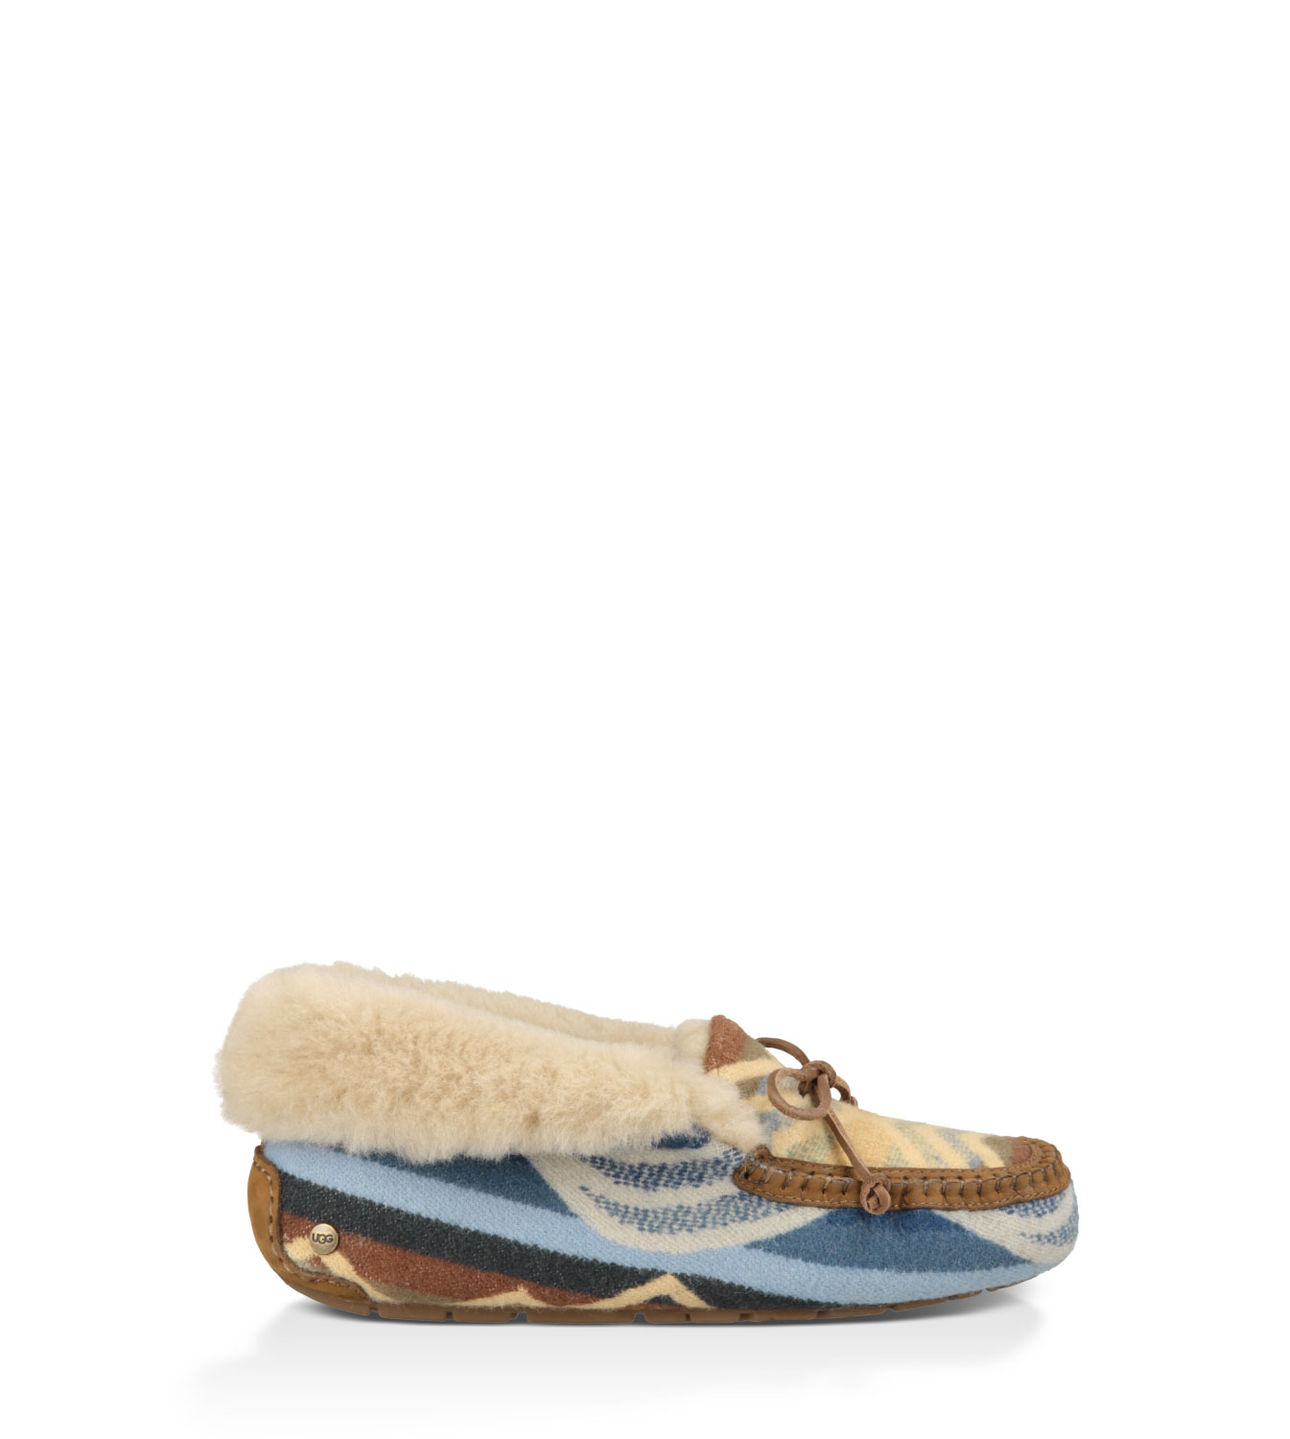 015a8a6b647 Best UGG Slippers | UGG Australia Slippers - SHEfinds